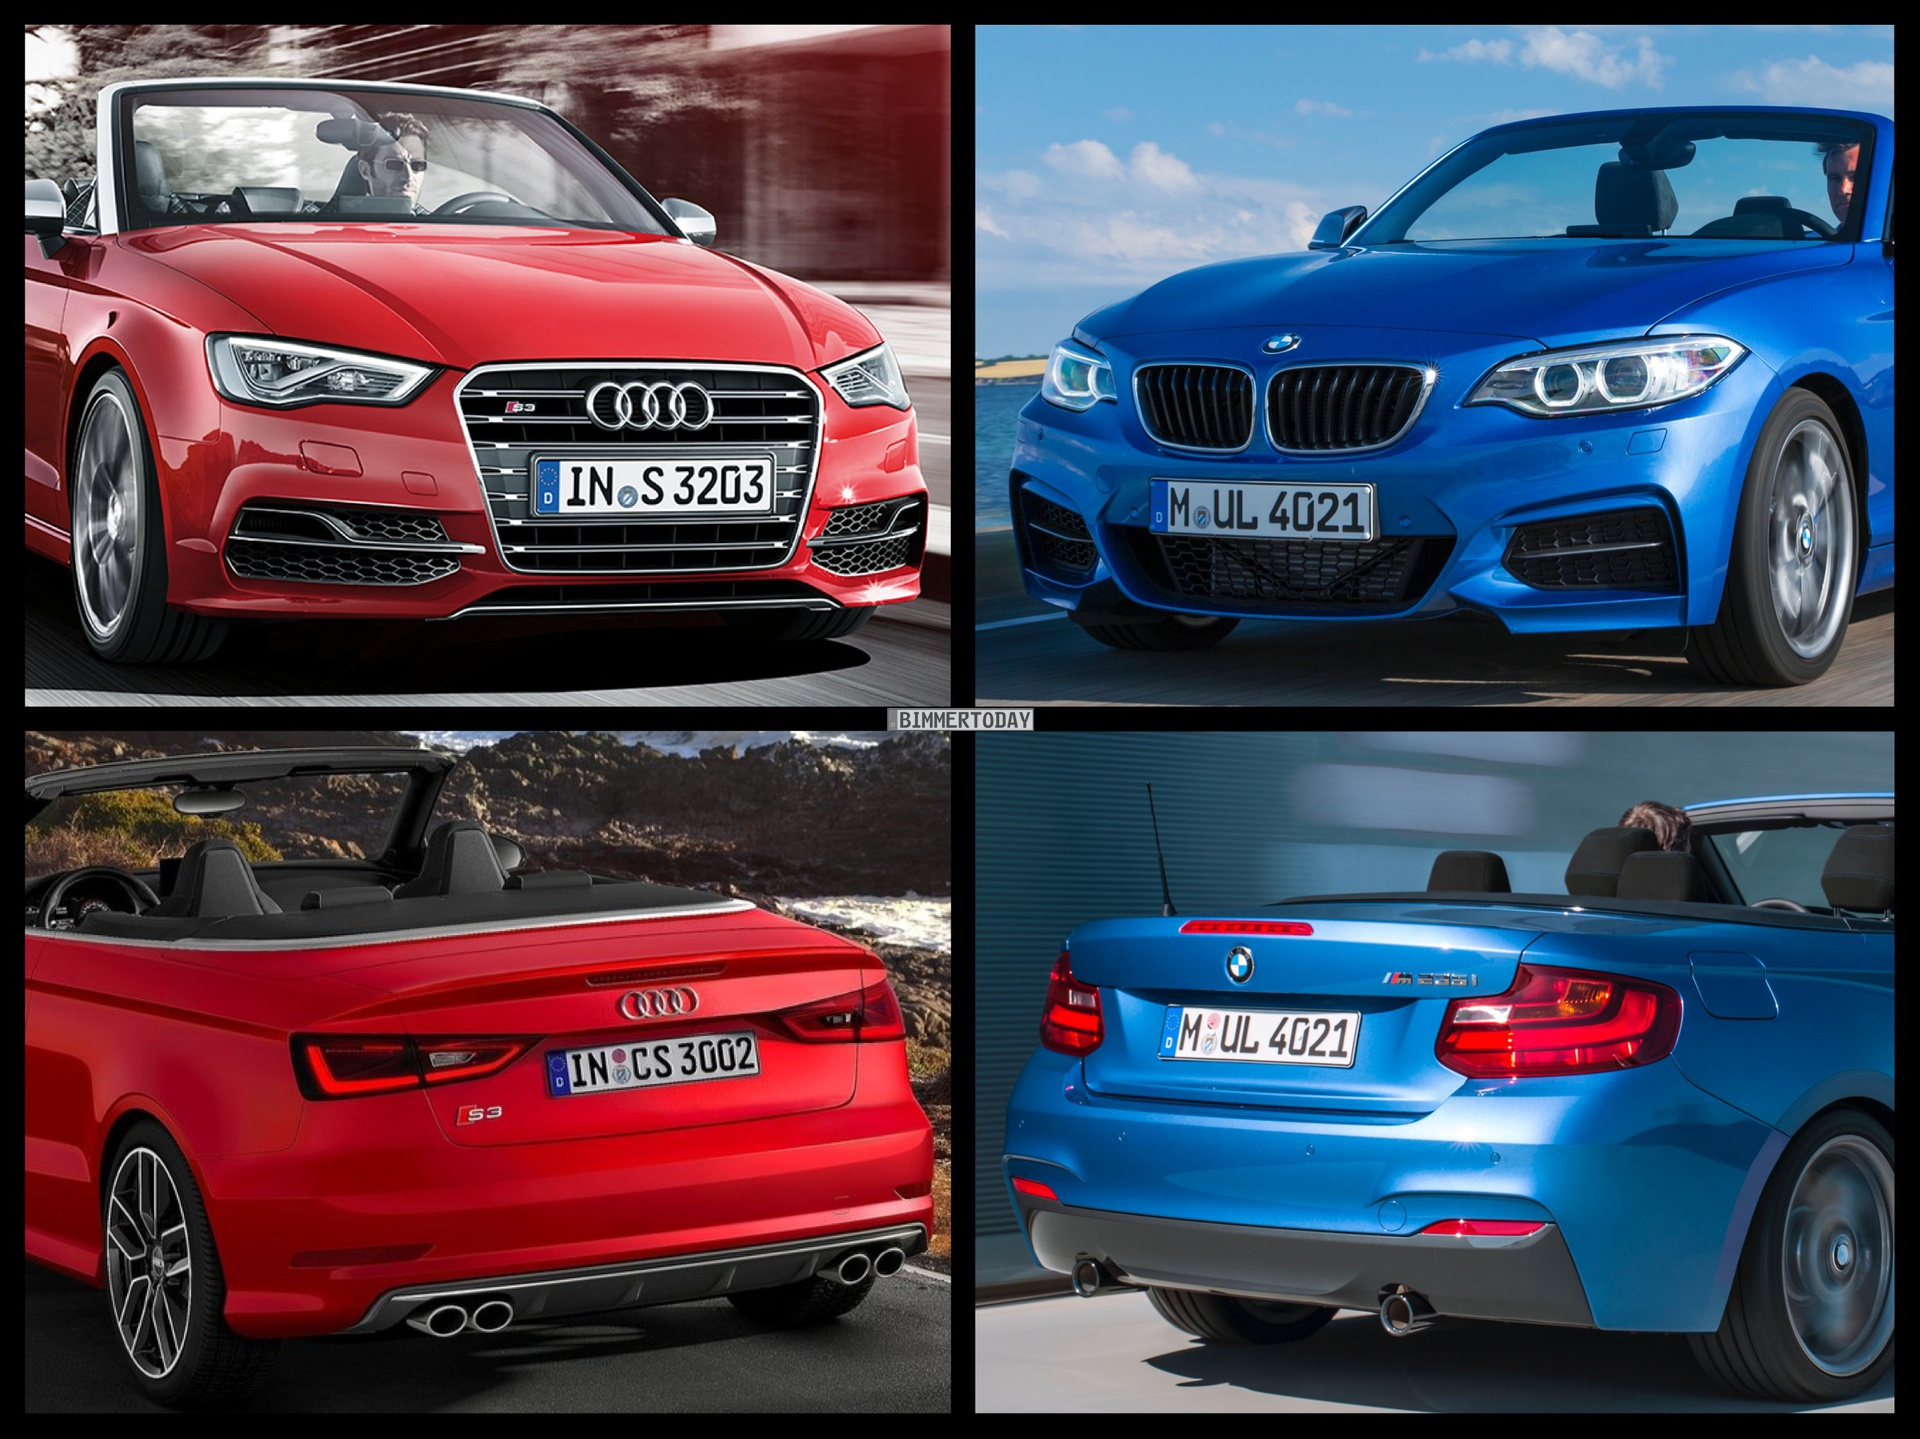 Bild Vergleich BMW 2er F23 M235i Audi S3 Cabrio 2014 01